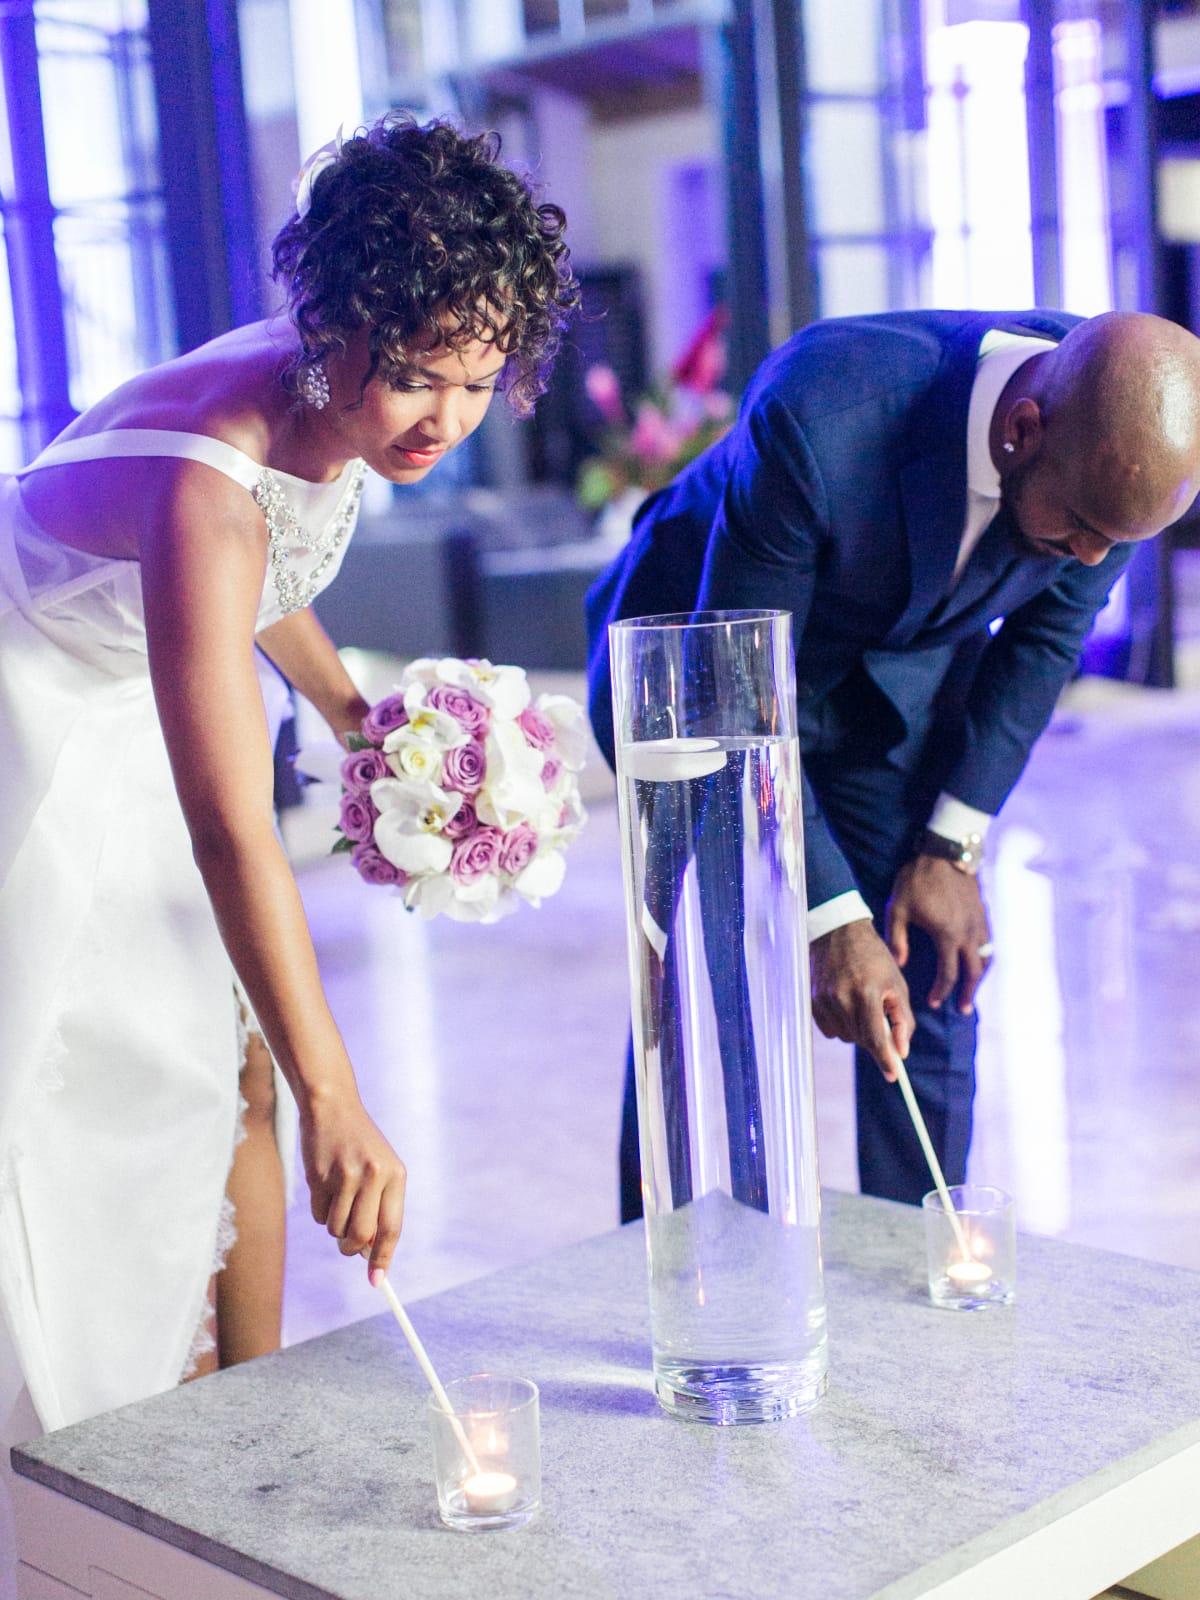 Wonderful Weddings, Kendhal Gardner, Feb. 2016, bridesmaids